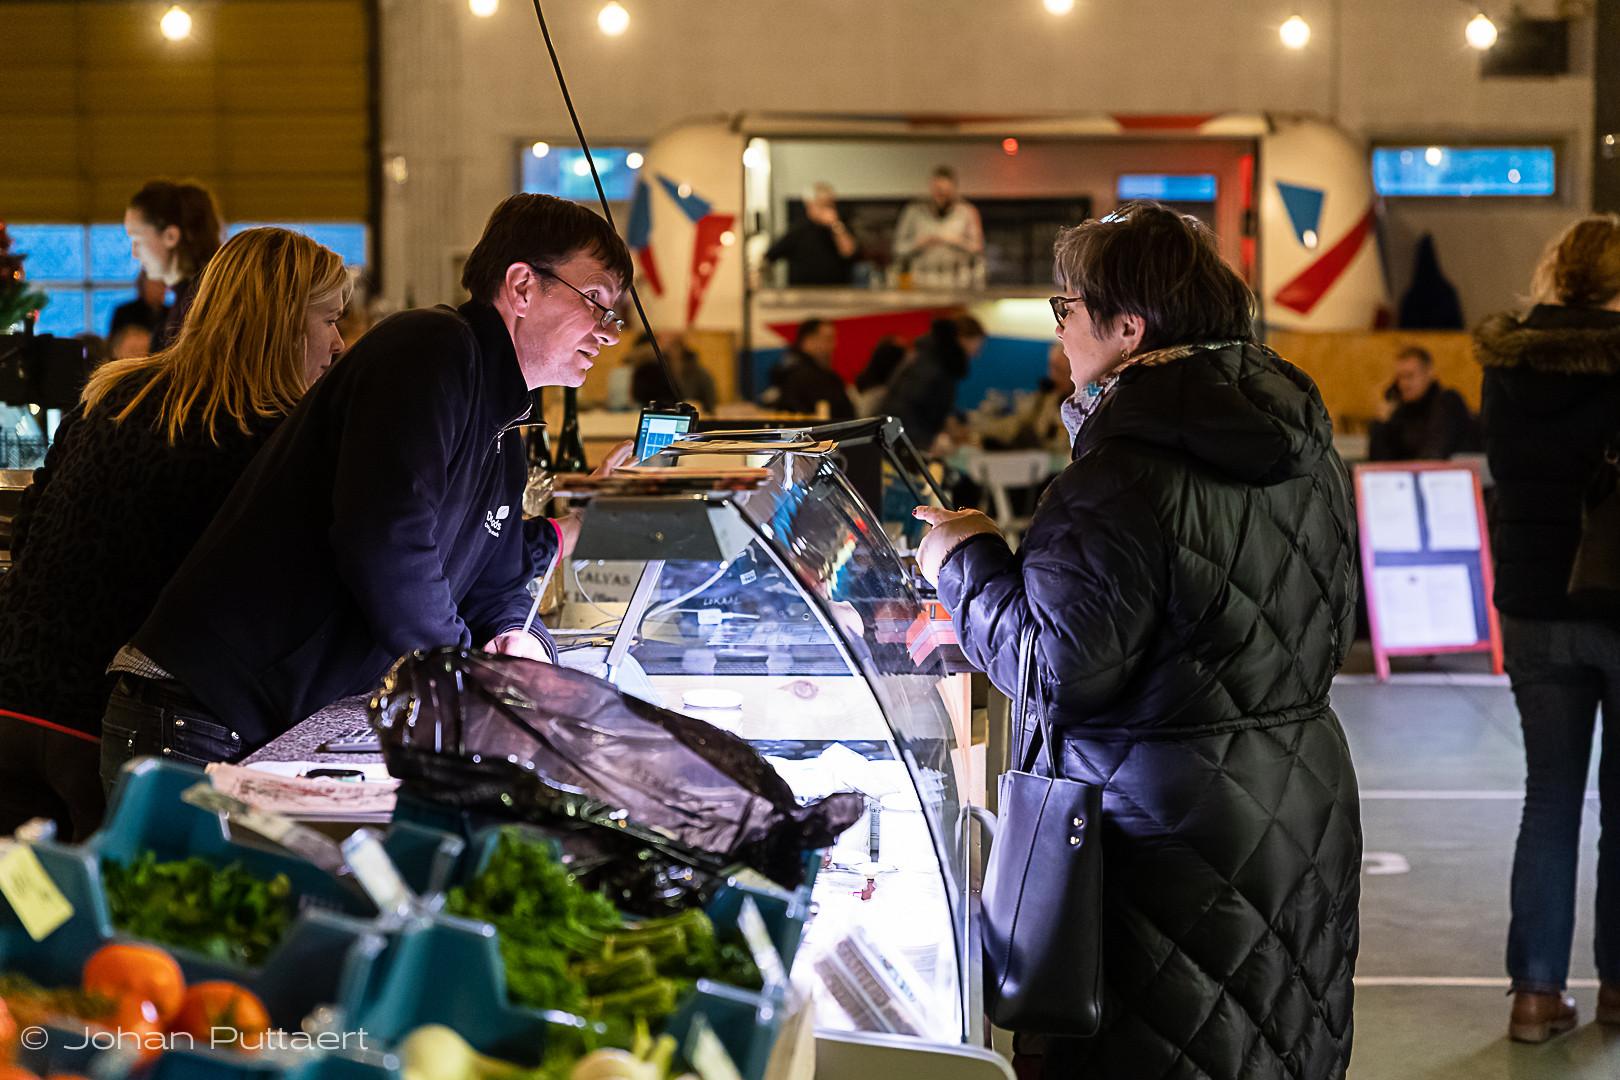 Lokaalmarkt_aalst_181221_0111.jpg